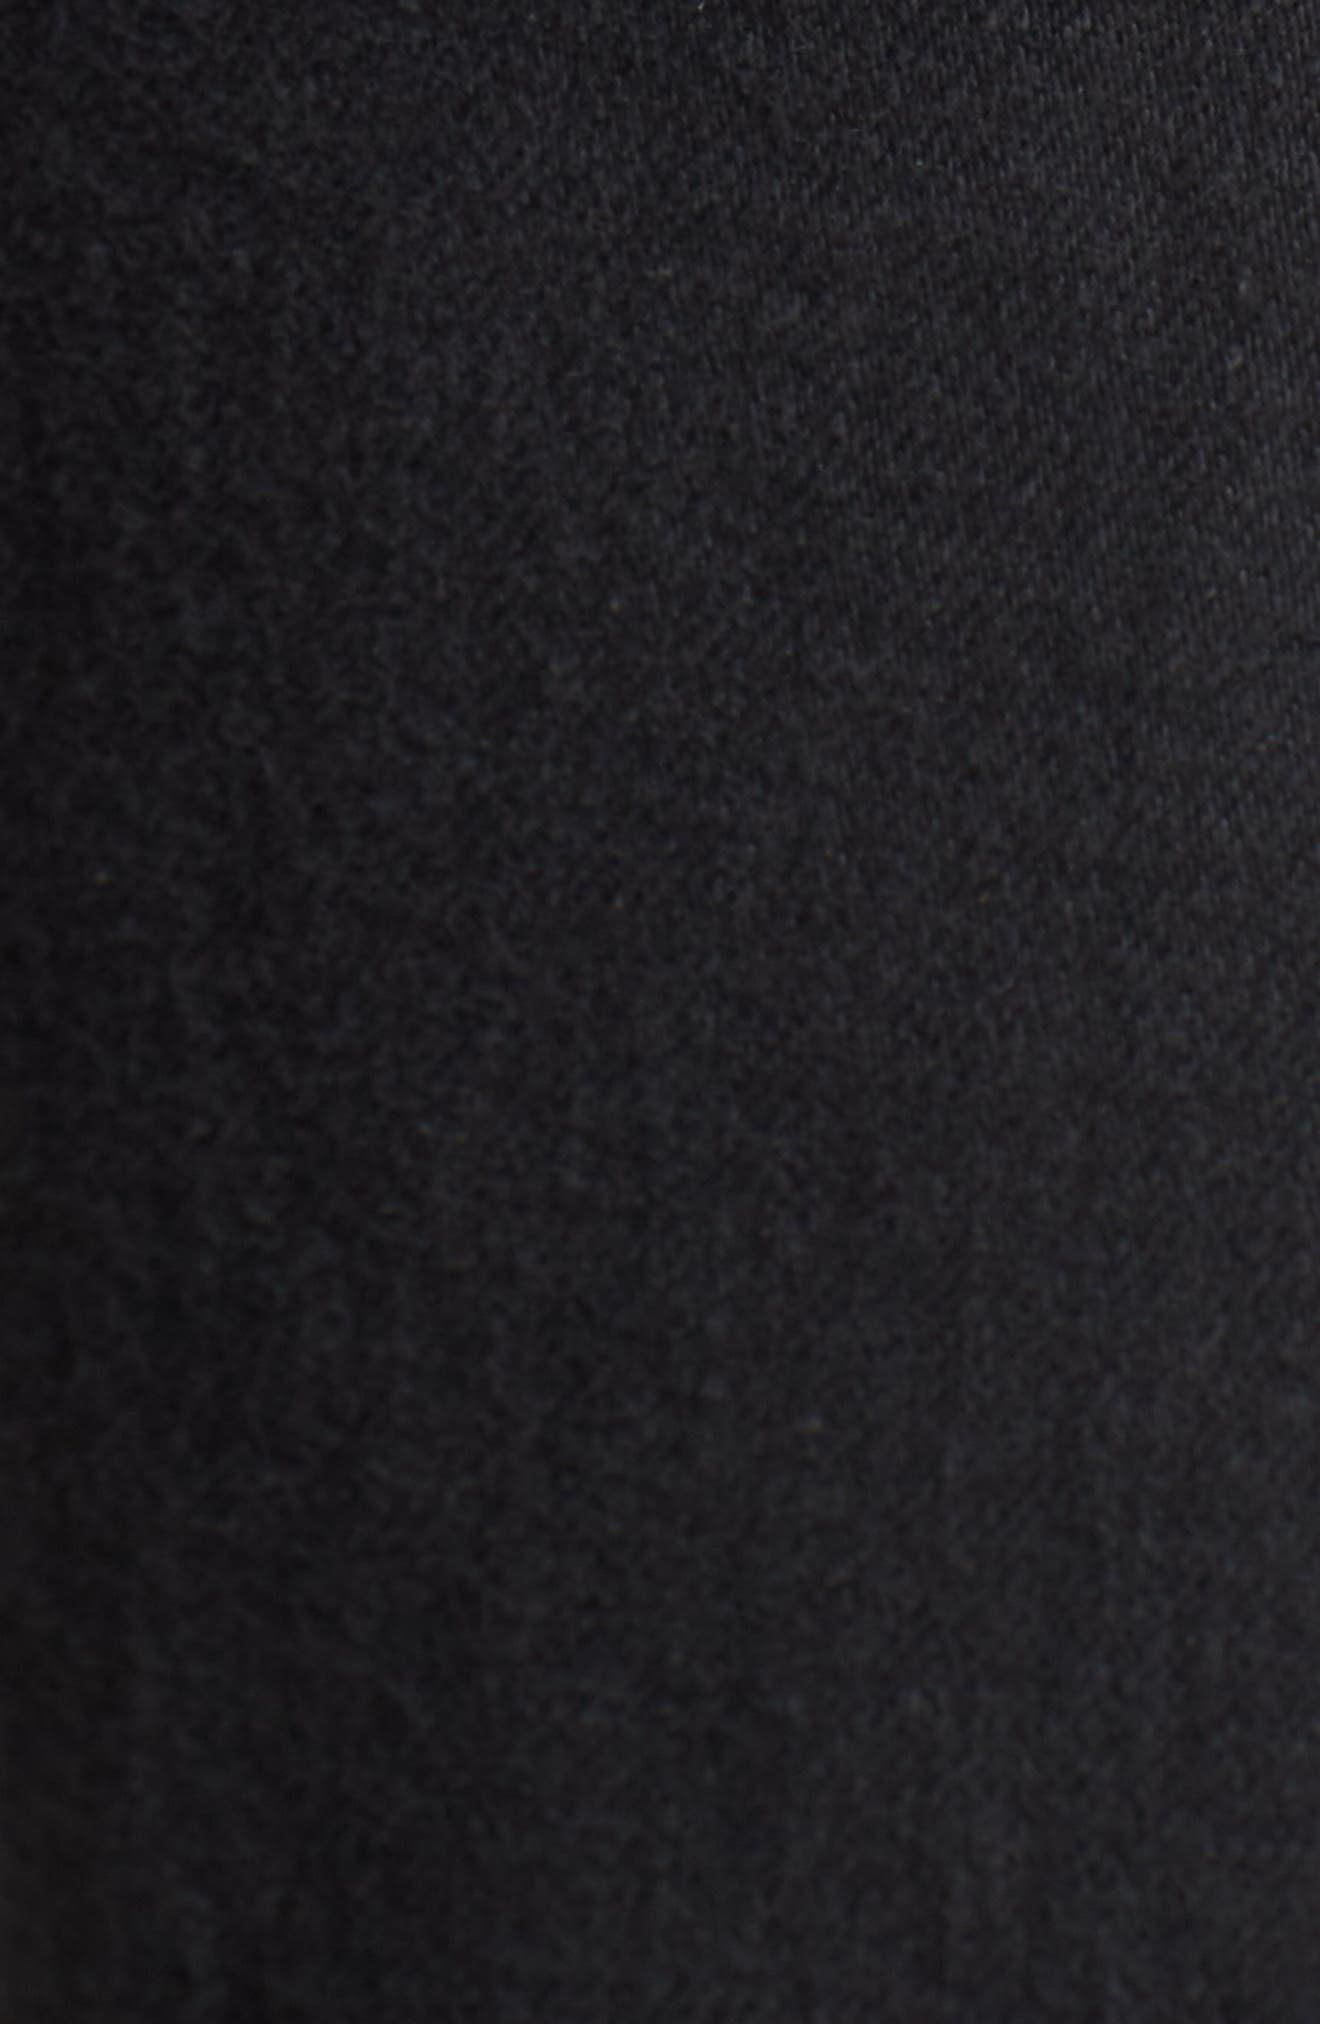 Fit 2 Slim Fit Jeans,                             Alternate thumbnail 5, color,                             SHELTER